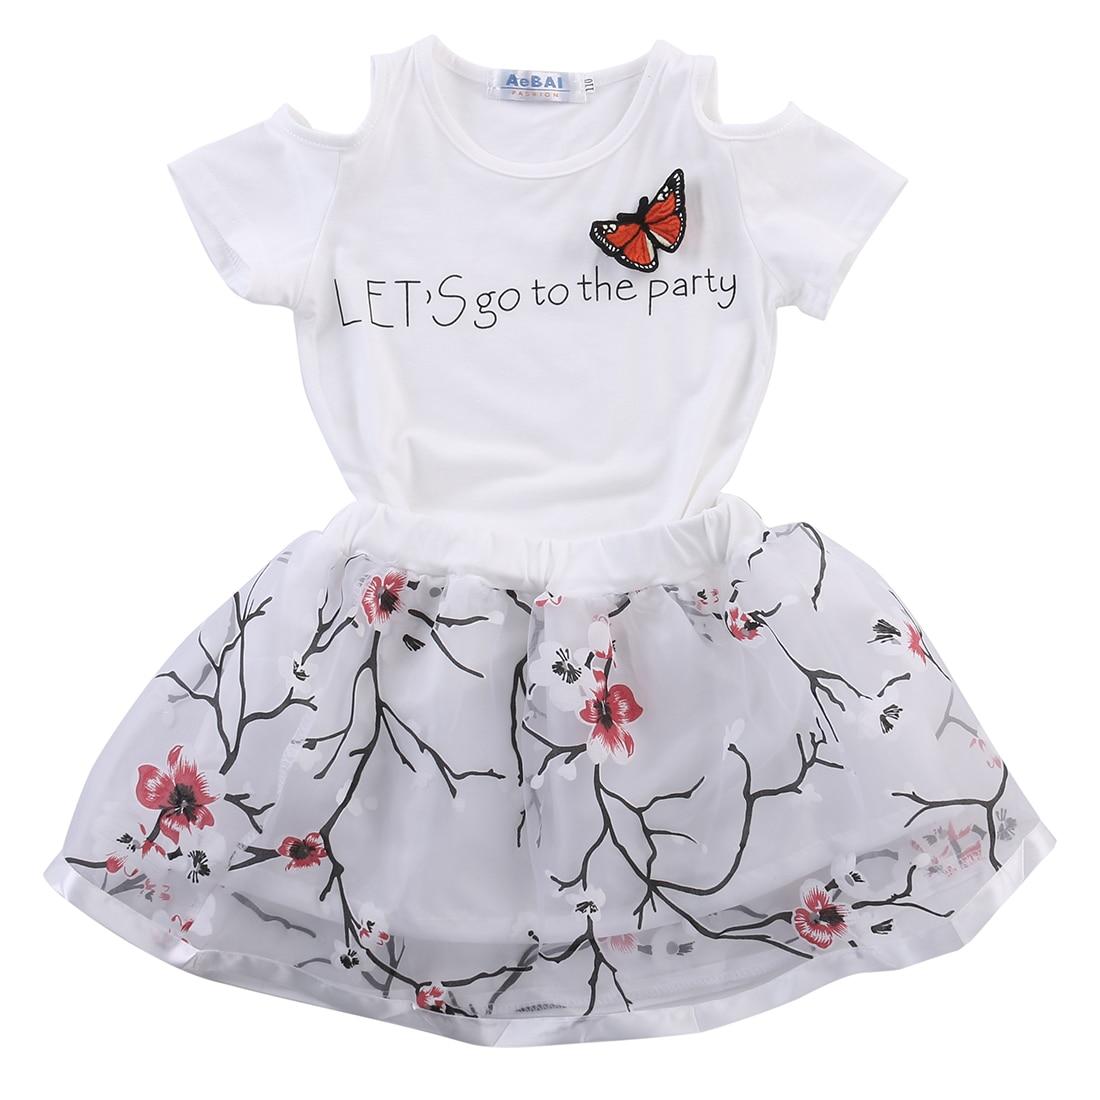 2PCS Toddler Infant Kids Child Baby Girls T Shirt Tops Flower Tutu Skirt Outfits Clothes Cute Set